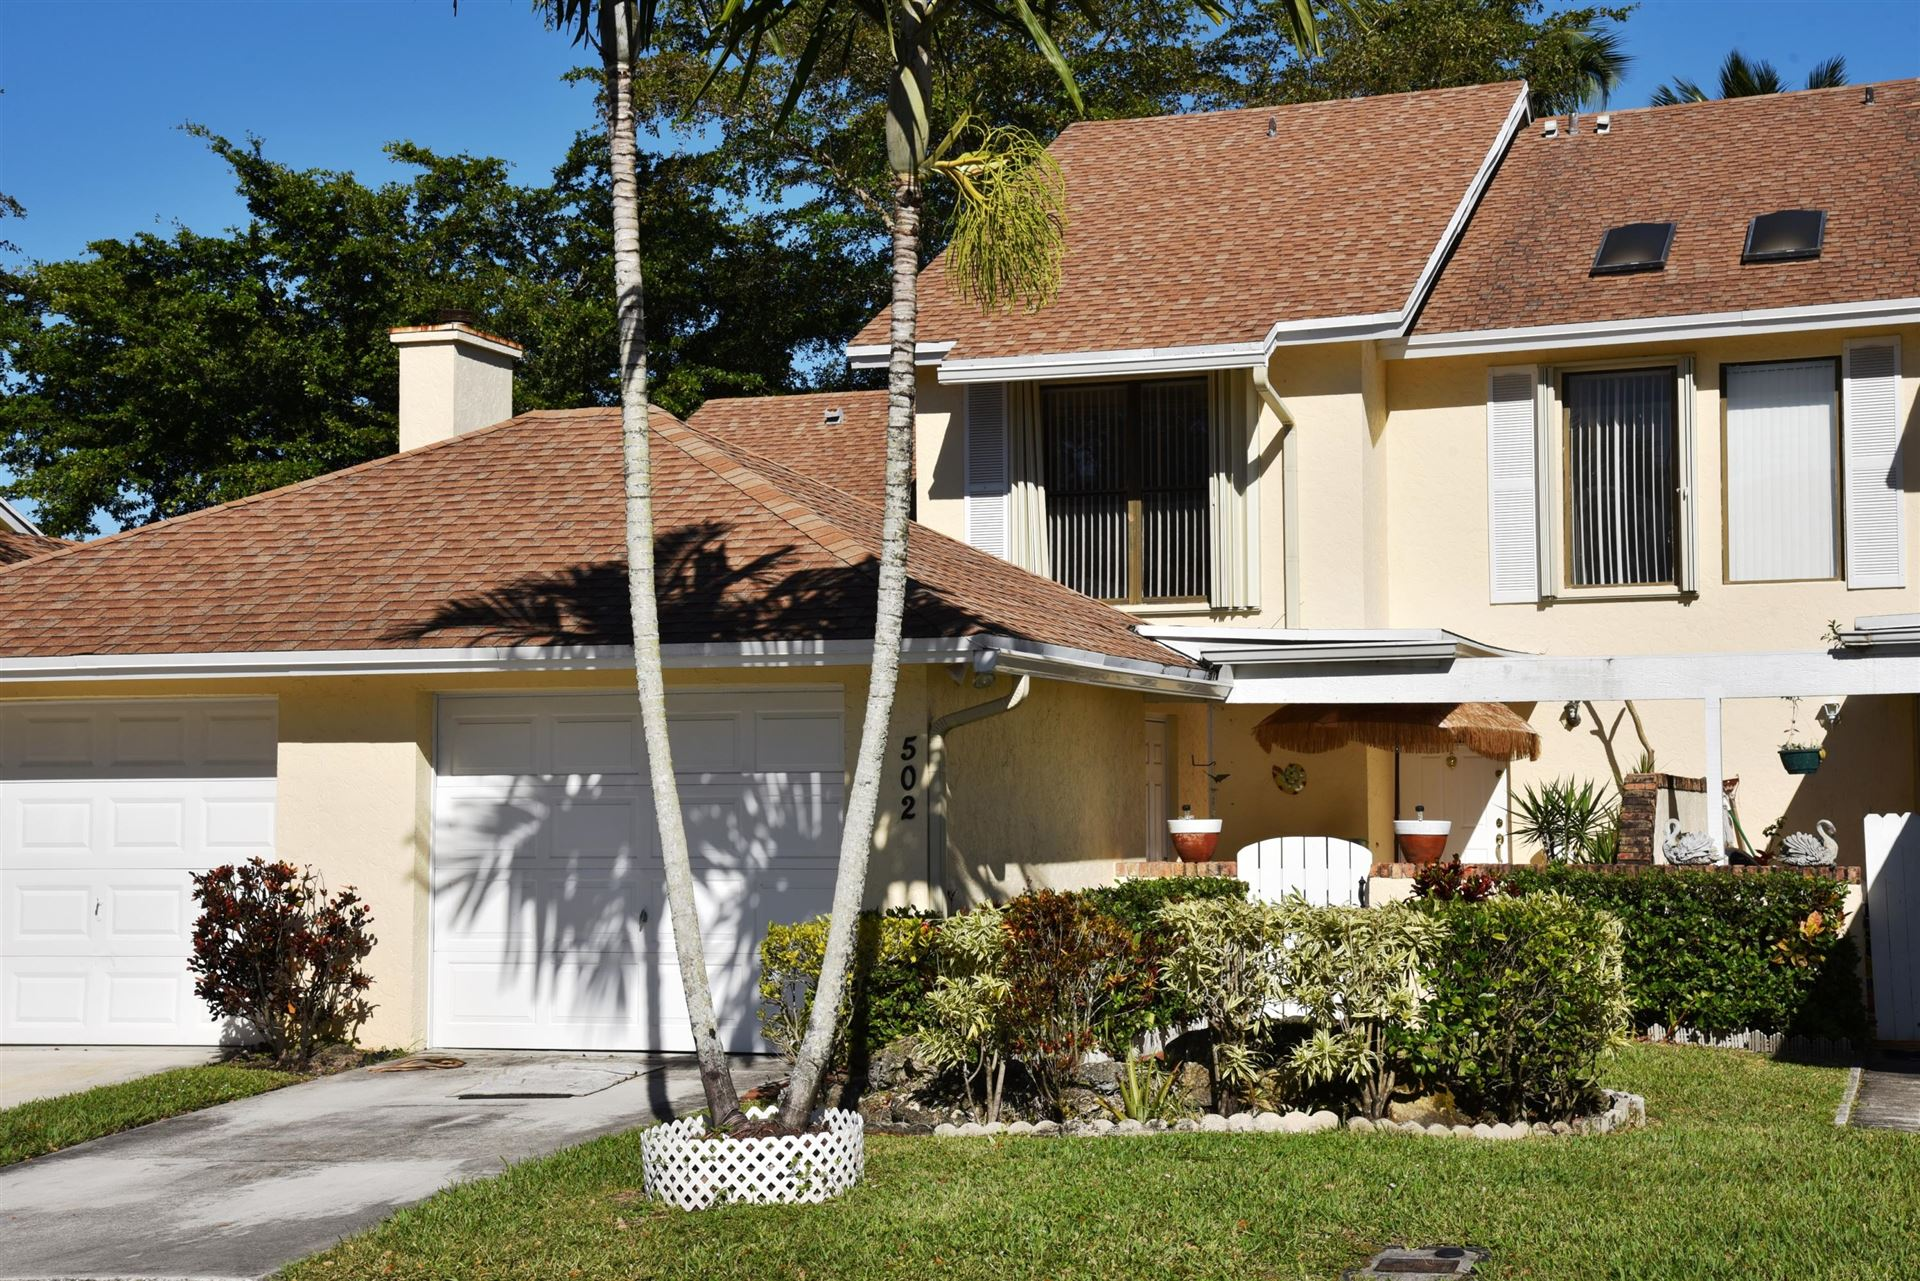 502 Maplewood Drive, Greenacres, FL 33415 - #: RX-10588371